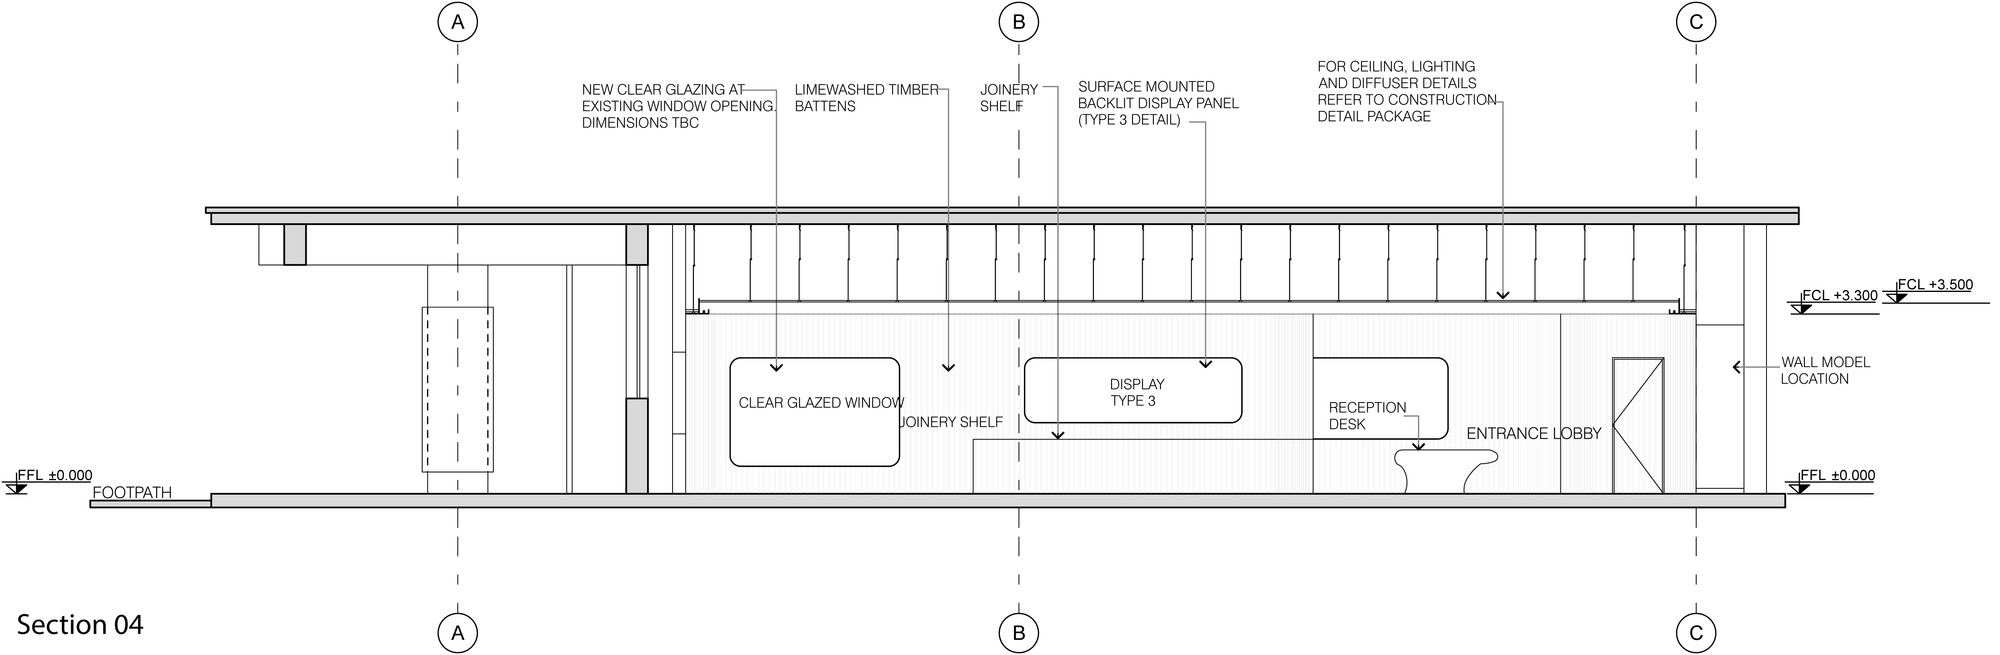 hight resolution of gallery of sydney greenland centre marketing suite ptw lava 16 skoda work manuals u003e fabia skoda felicia ignition switch wiring diagram